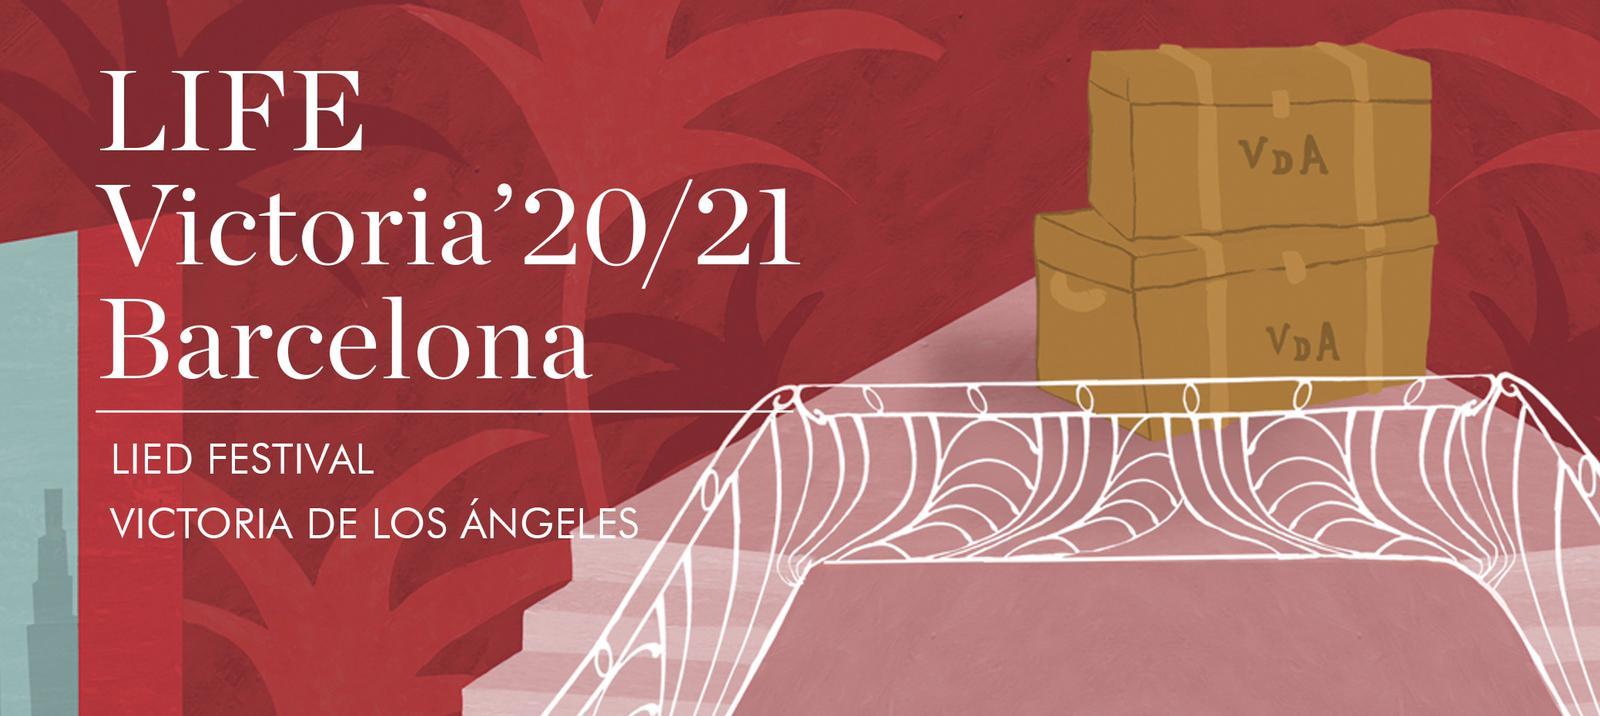 Ven Al Festival Life Victoria Con Los Amics!